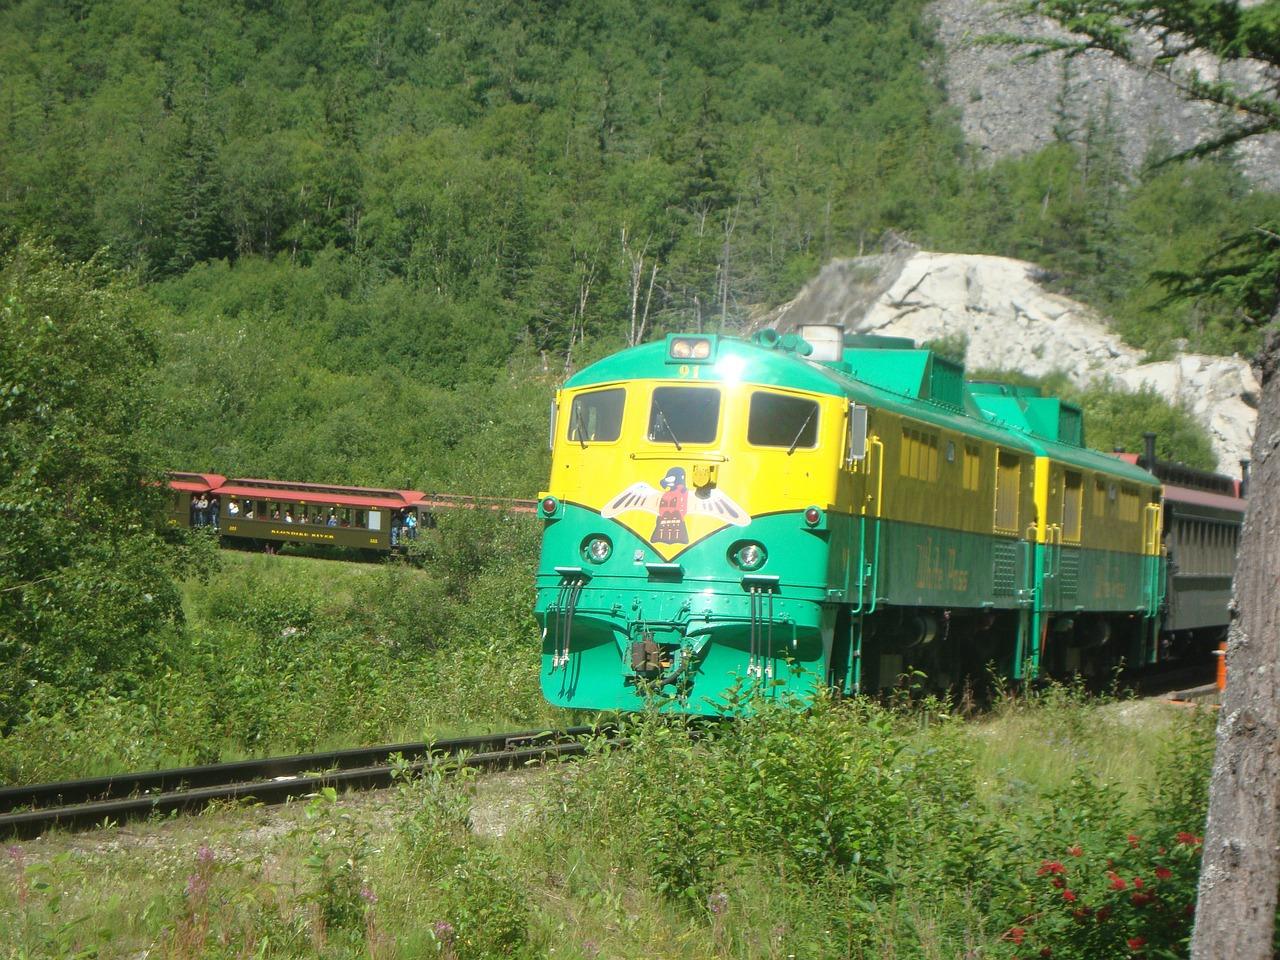 skagway alaska train track transportation free photo from